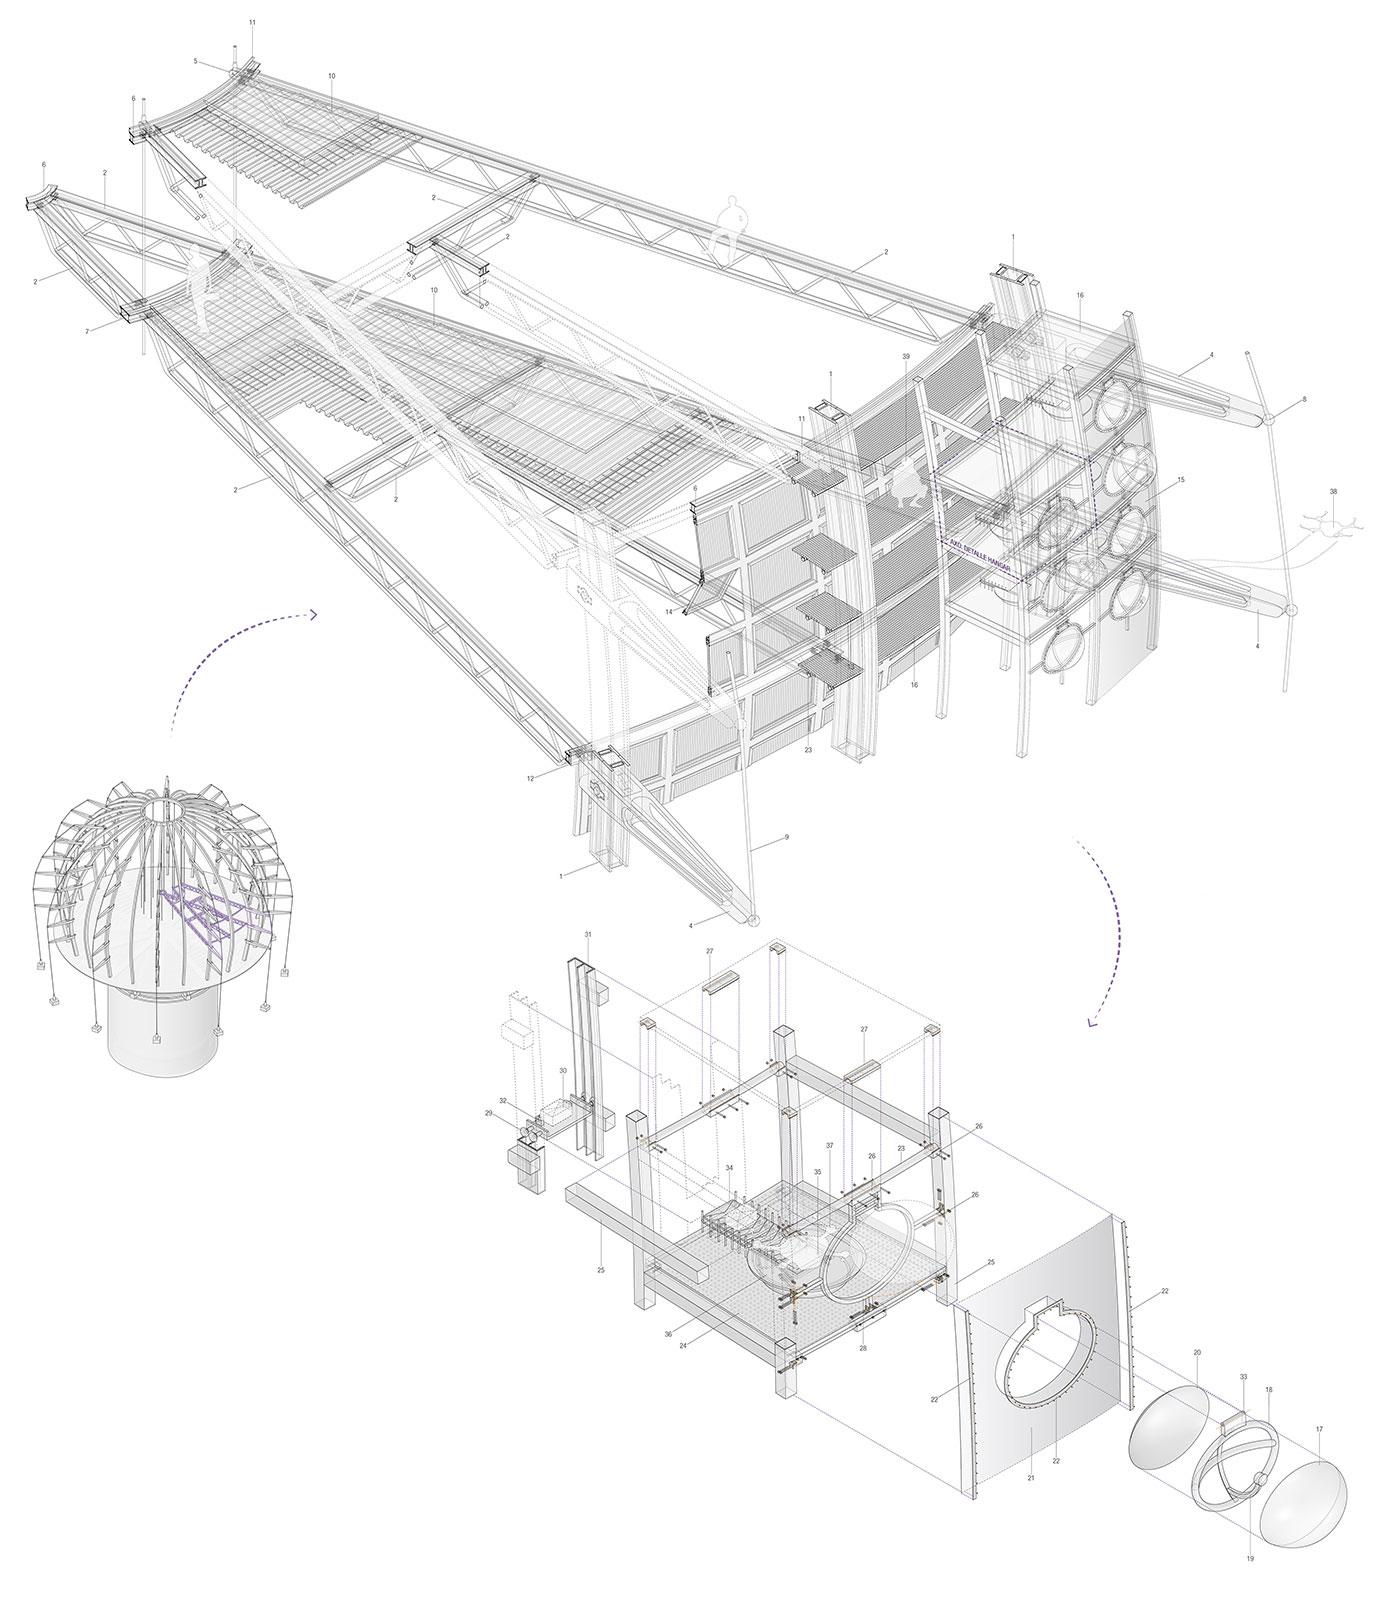 Axonométrica constructiva del edificcio